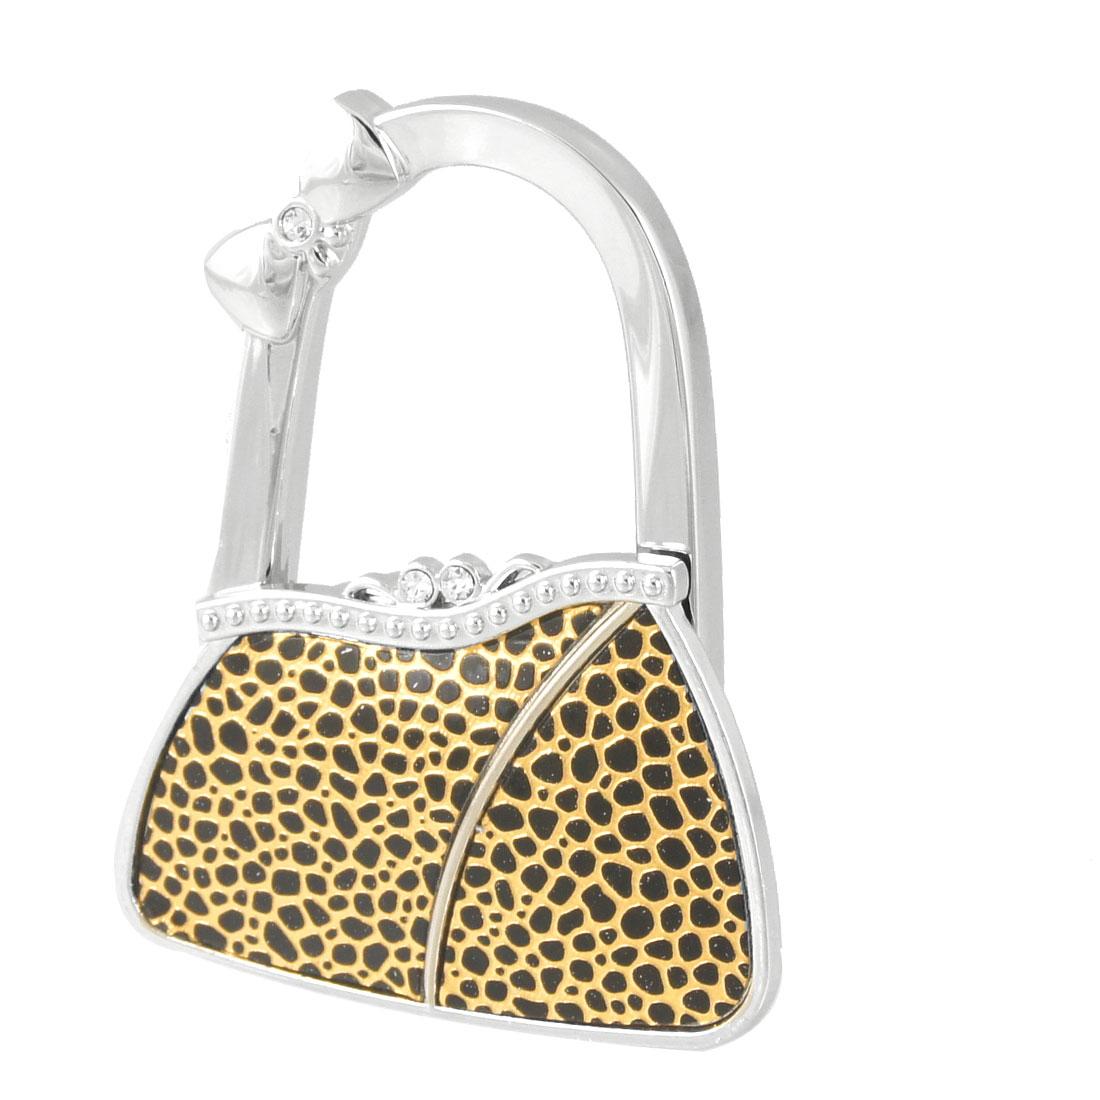 Rhinestone Inlaid Bag Shaped Foldable Handbag Hook Hanger Black Gold Tone